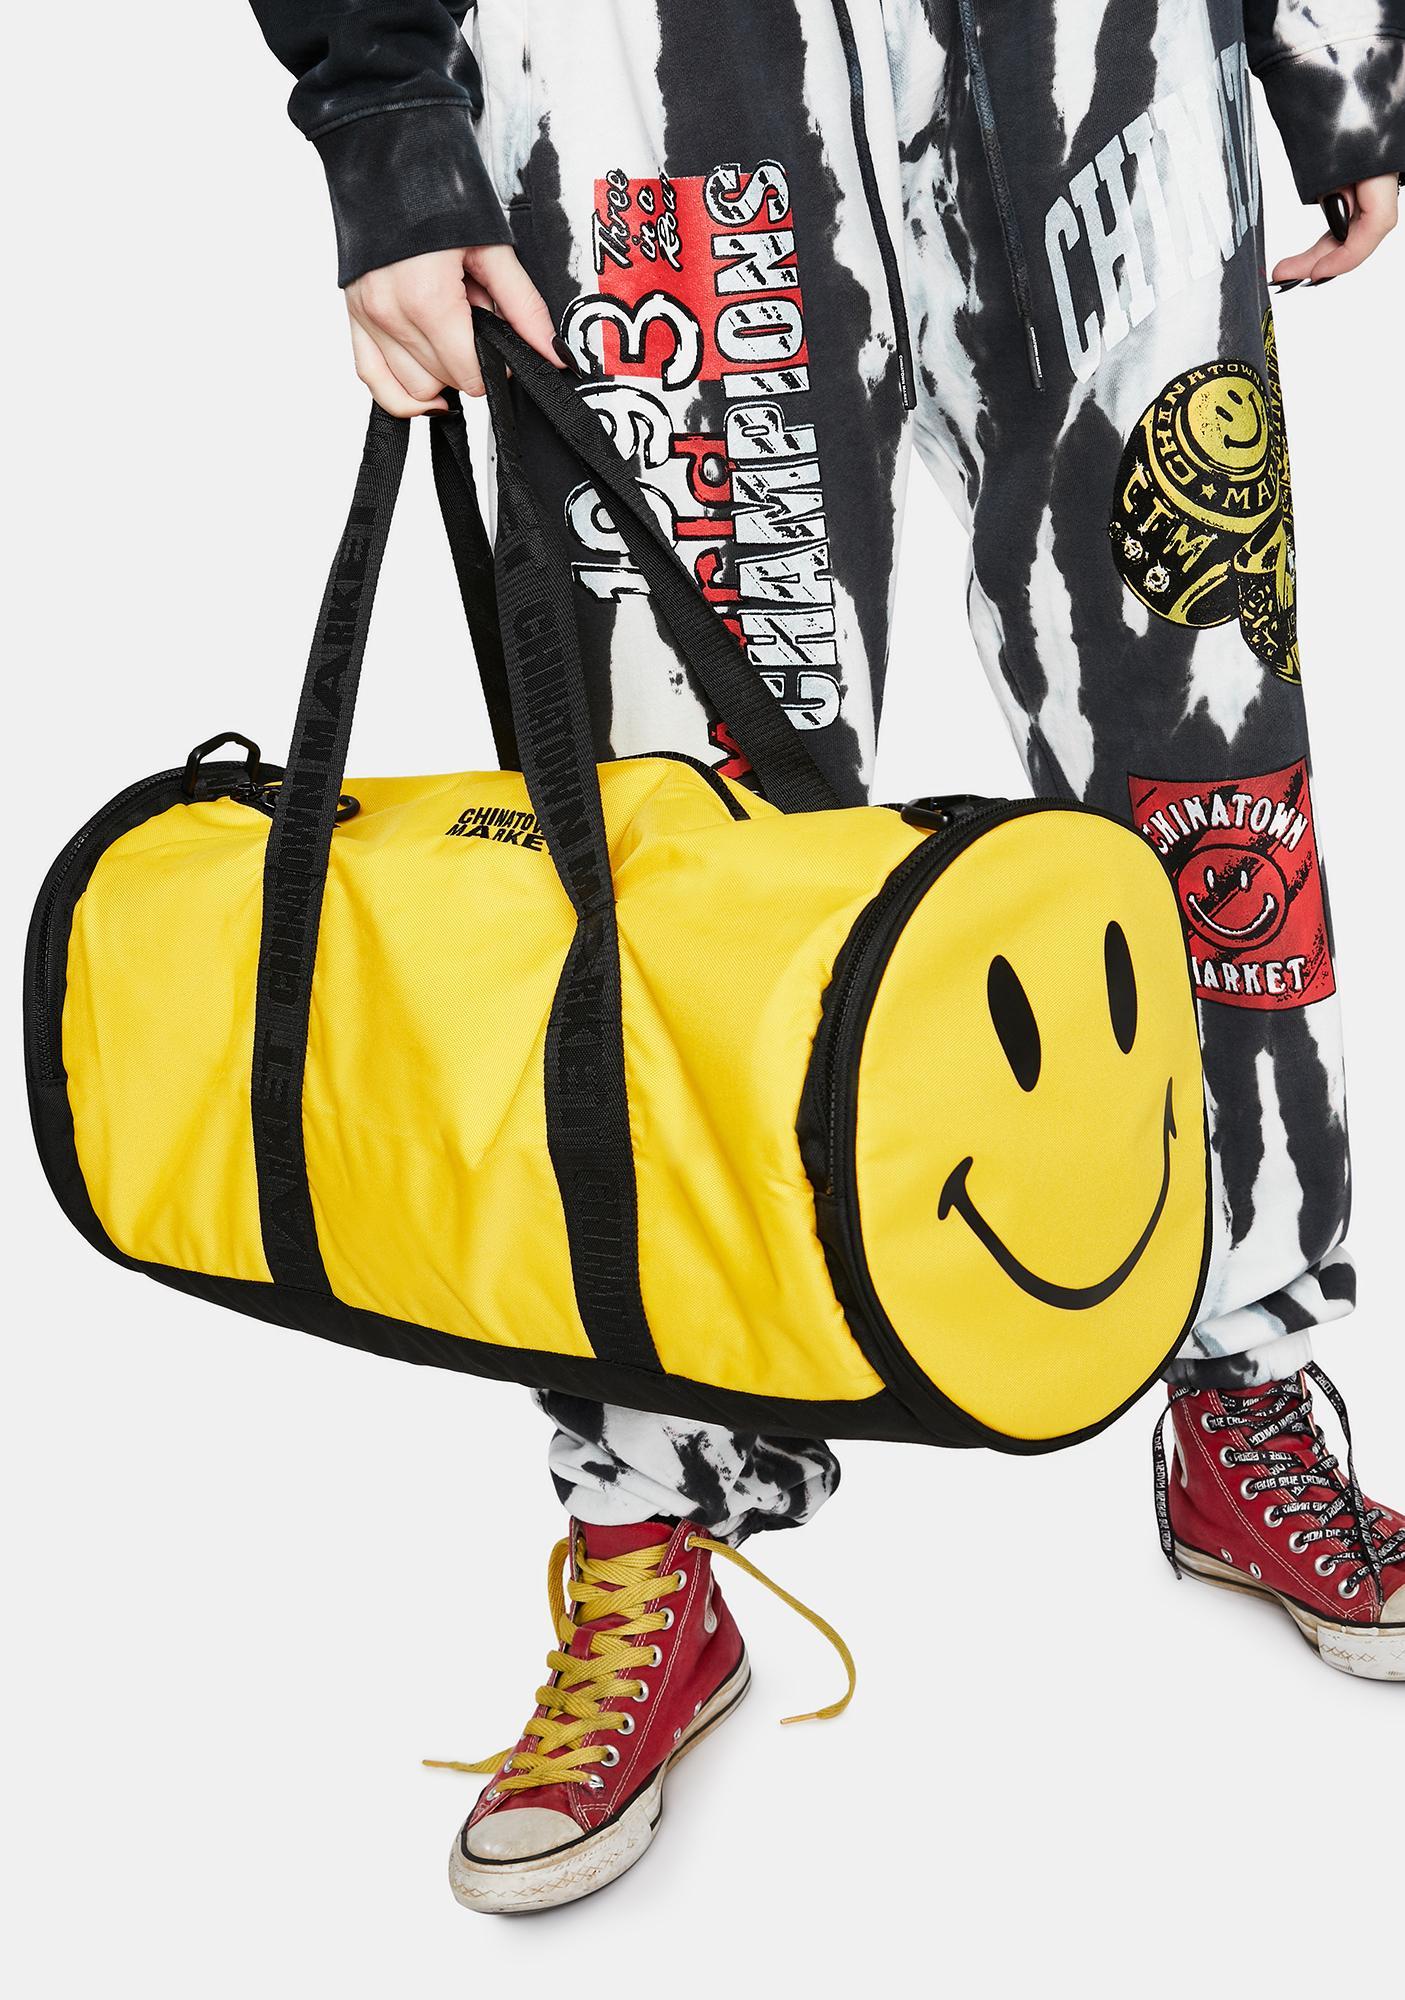 CHINATOWN MARKET Smiley Duffle Bag